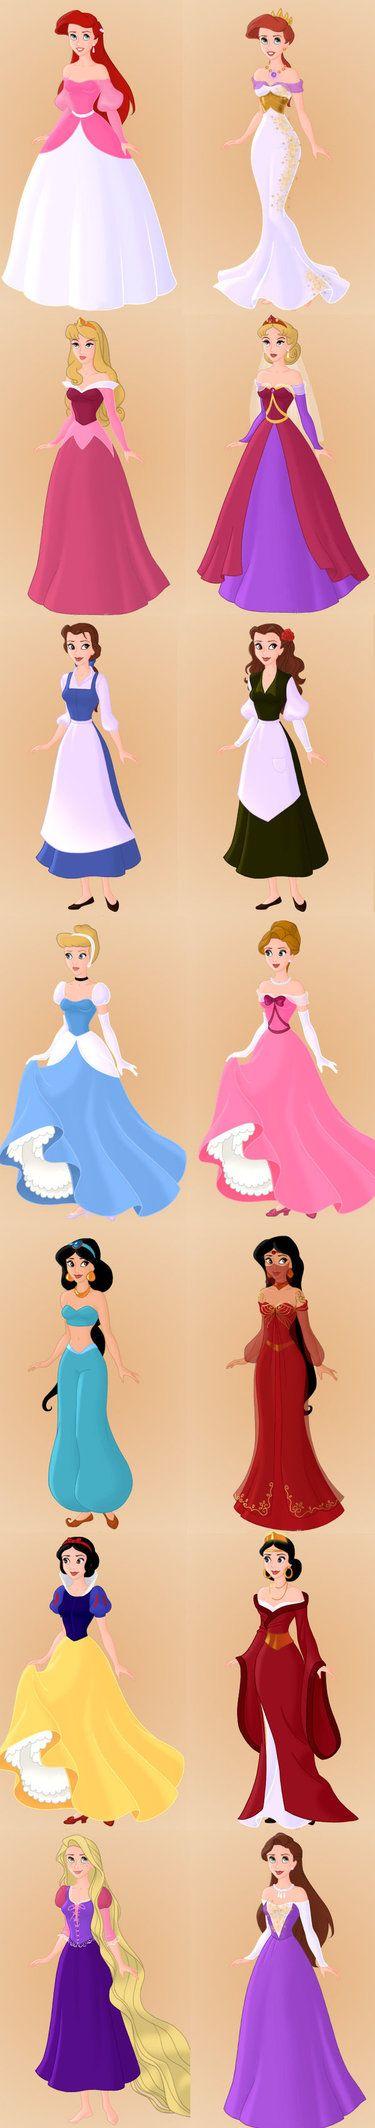 Disney Princesses And Their Moms by foreverbeginstoday on DeviantArt